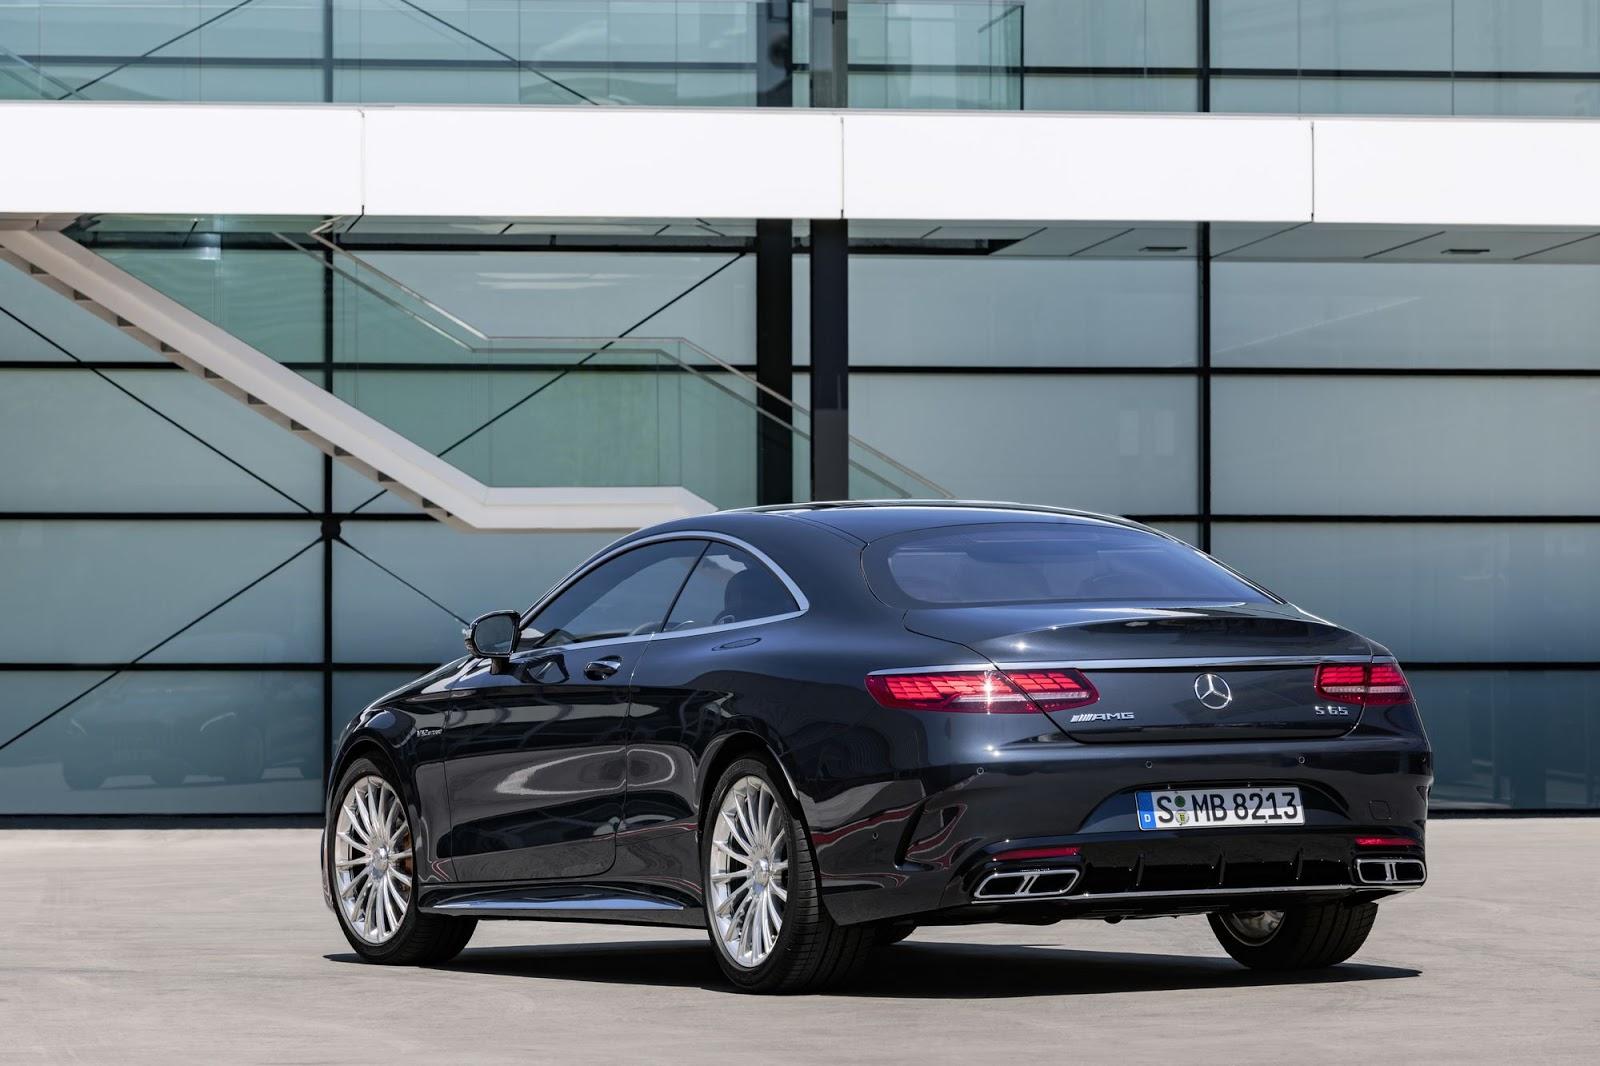 Mercedes-AMG S 65 Coupé, 2017. Exterieur: anthrazitblau metallic;Kraftstoffverbrauch kombiniert: 11,9 l/100 km; CO2-Emissionen kombiniert: 279 g/km*Mercedes-AMG S 65 Coupé, 2017. Exterior: anthracite blue metallic;Fuel consumption combined: 11.9 l/100 km; CO2 emissions combined: 279 g/km*